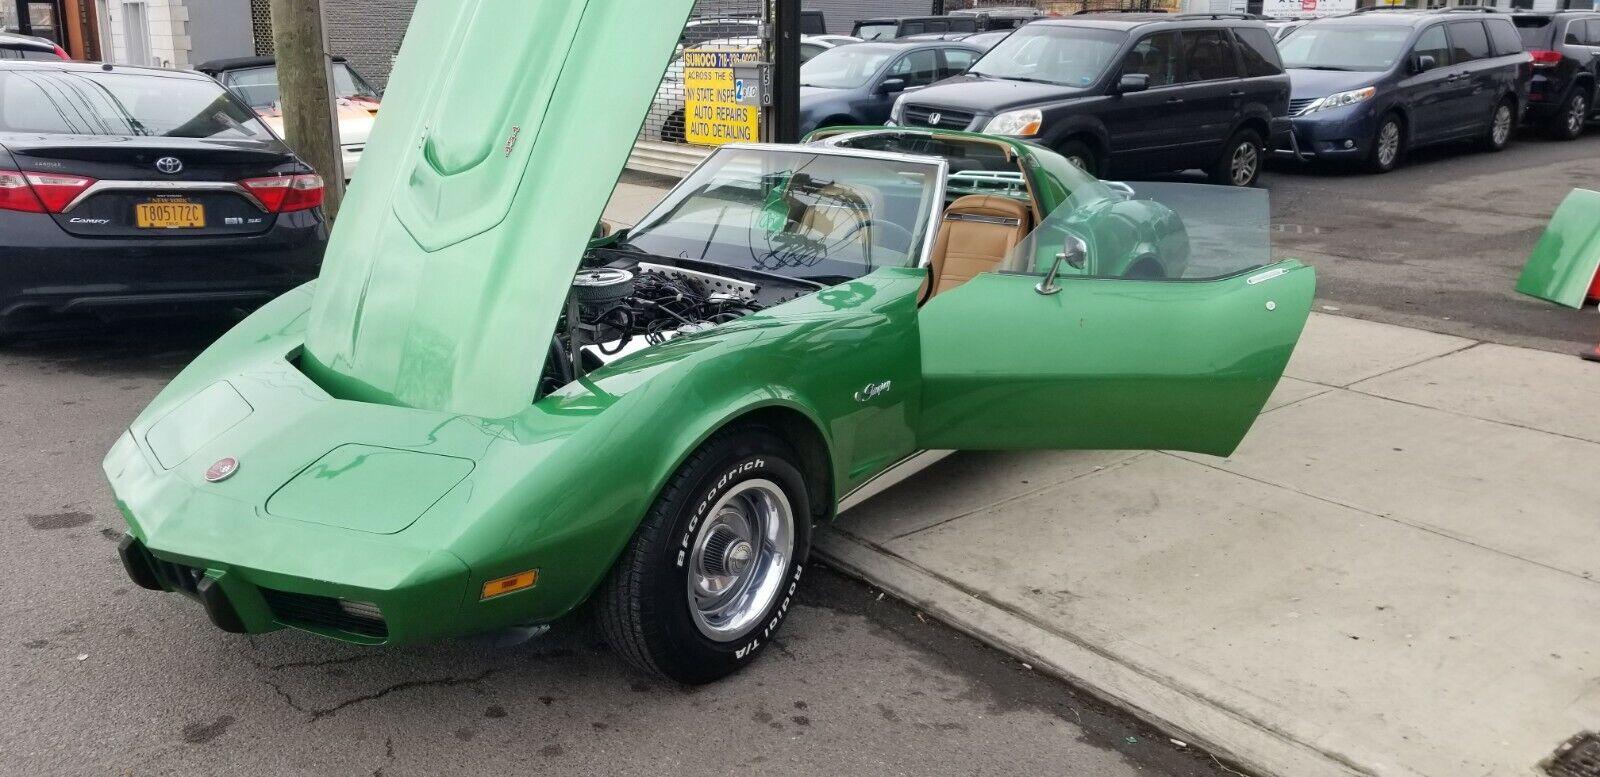 1975 Green Chevrolet Corvette   | C3 Corvette Photo 1